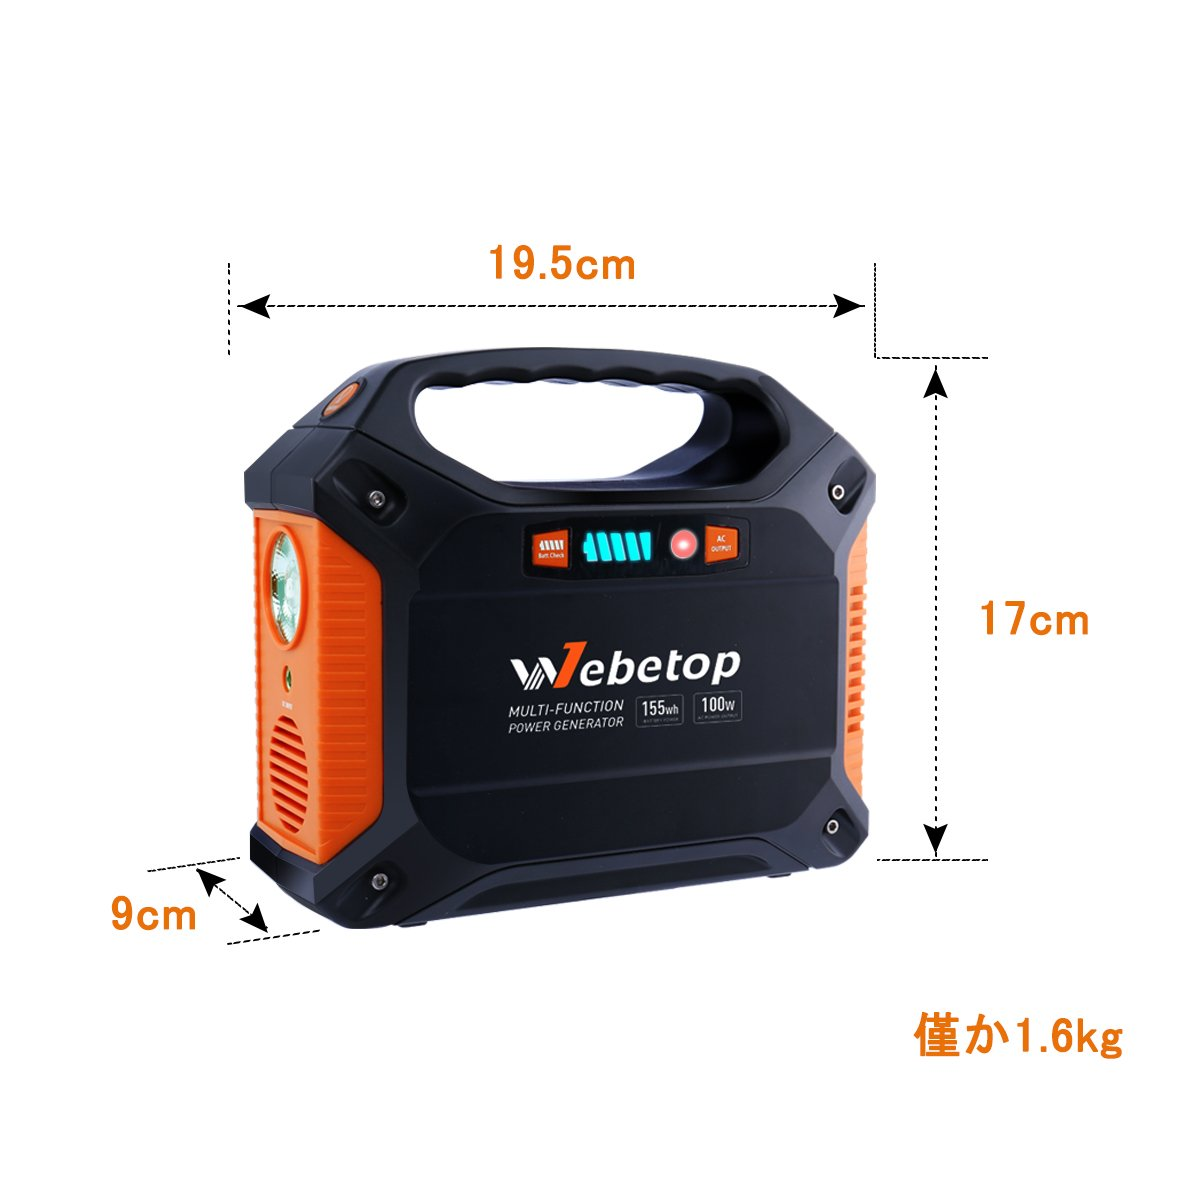 Webetop 155Whポータブル電源 家庭用蓄電池 大容量モバイルバッテリー 42000mAh